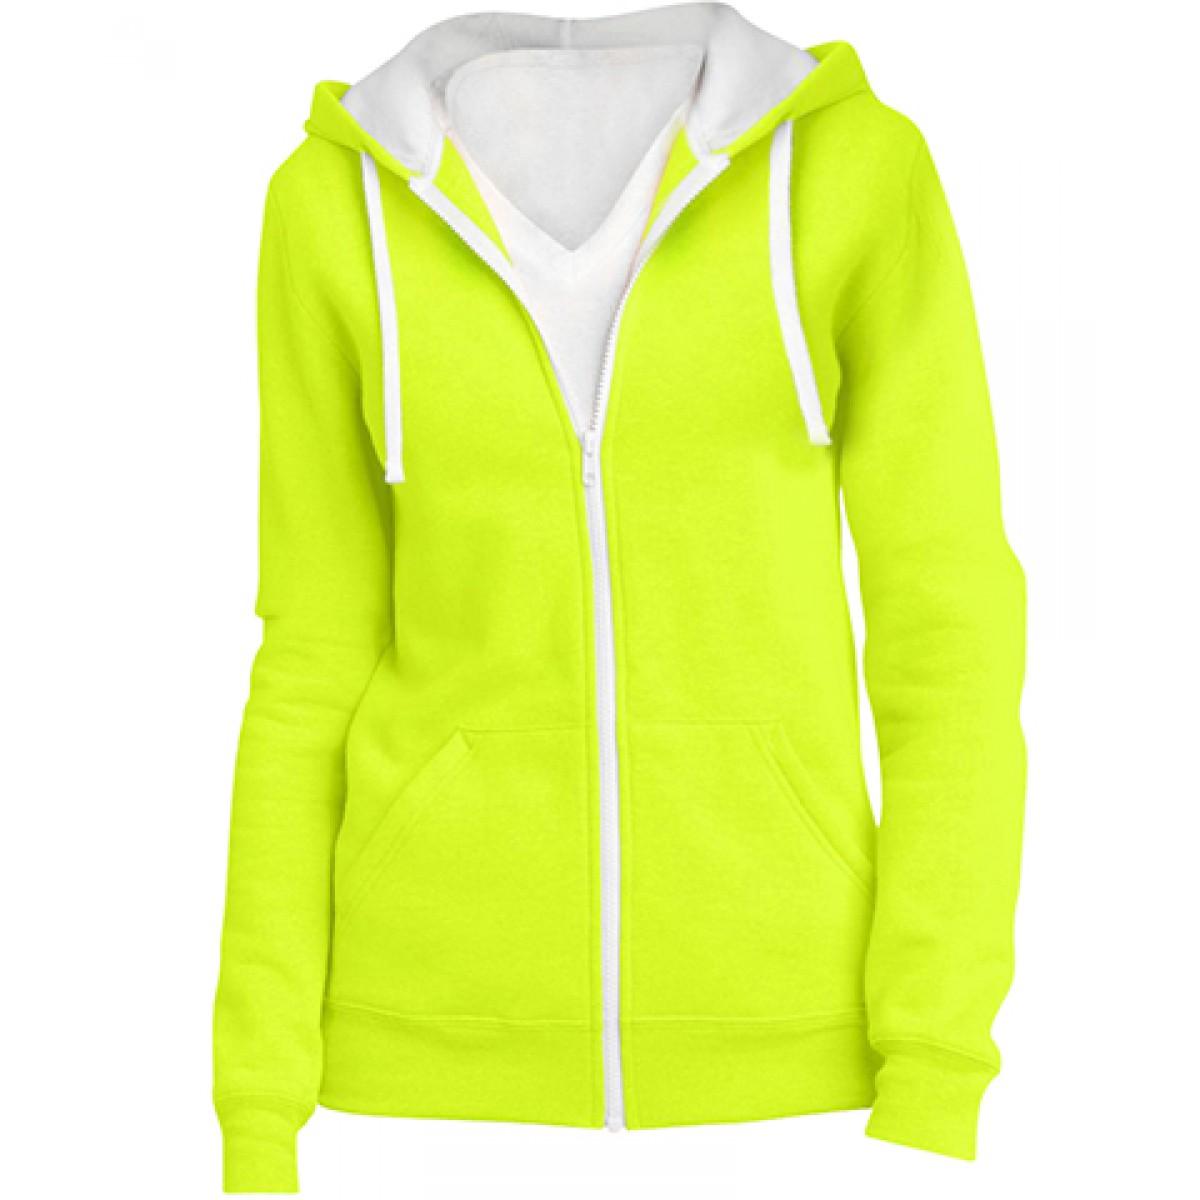 Juniors Full-Zip Hoodie-Safety Green-3XL